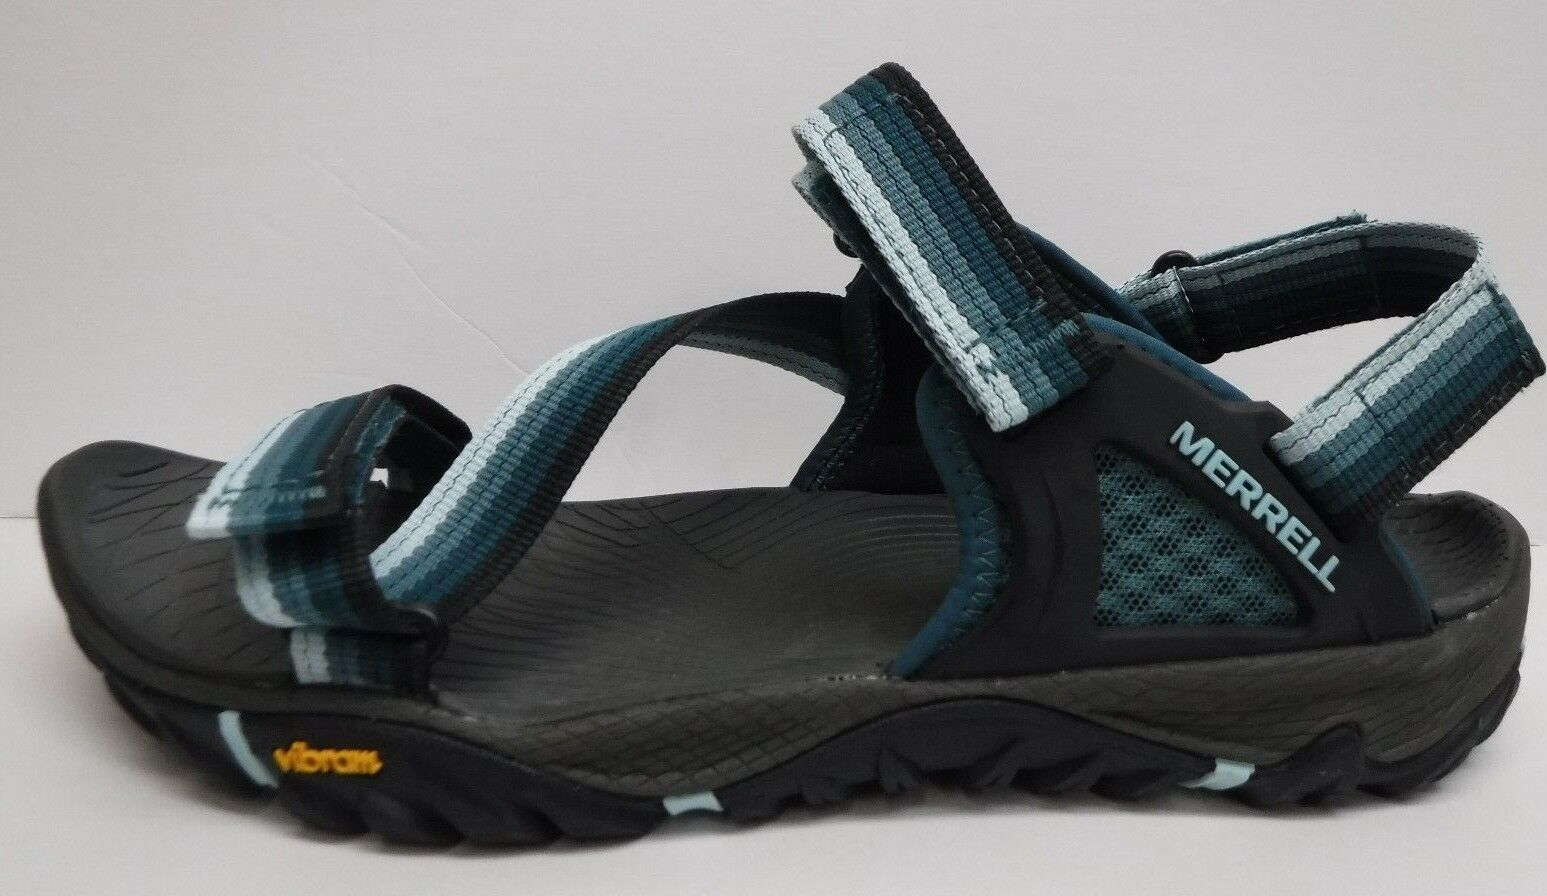 Merrell Vibram Size 10 Sandals Vibram Merrell Soles New Donna Shoes fbb8cc